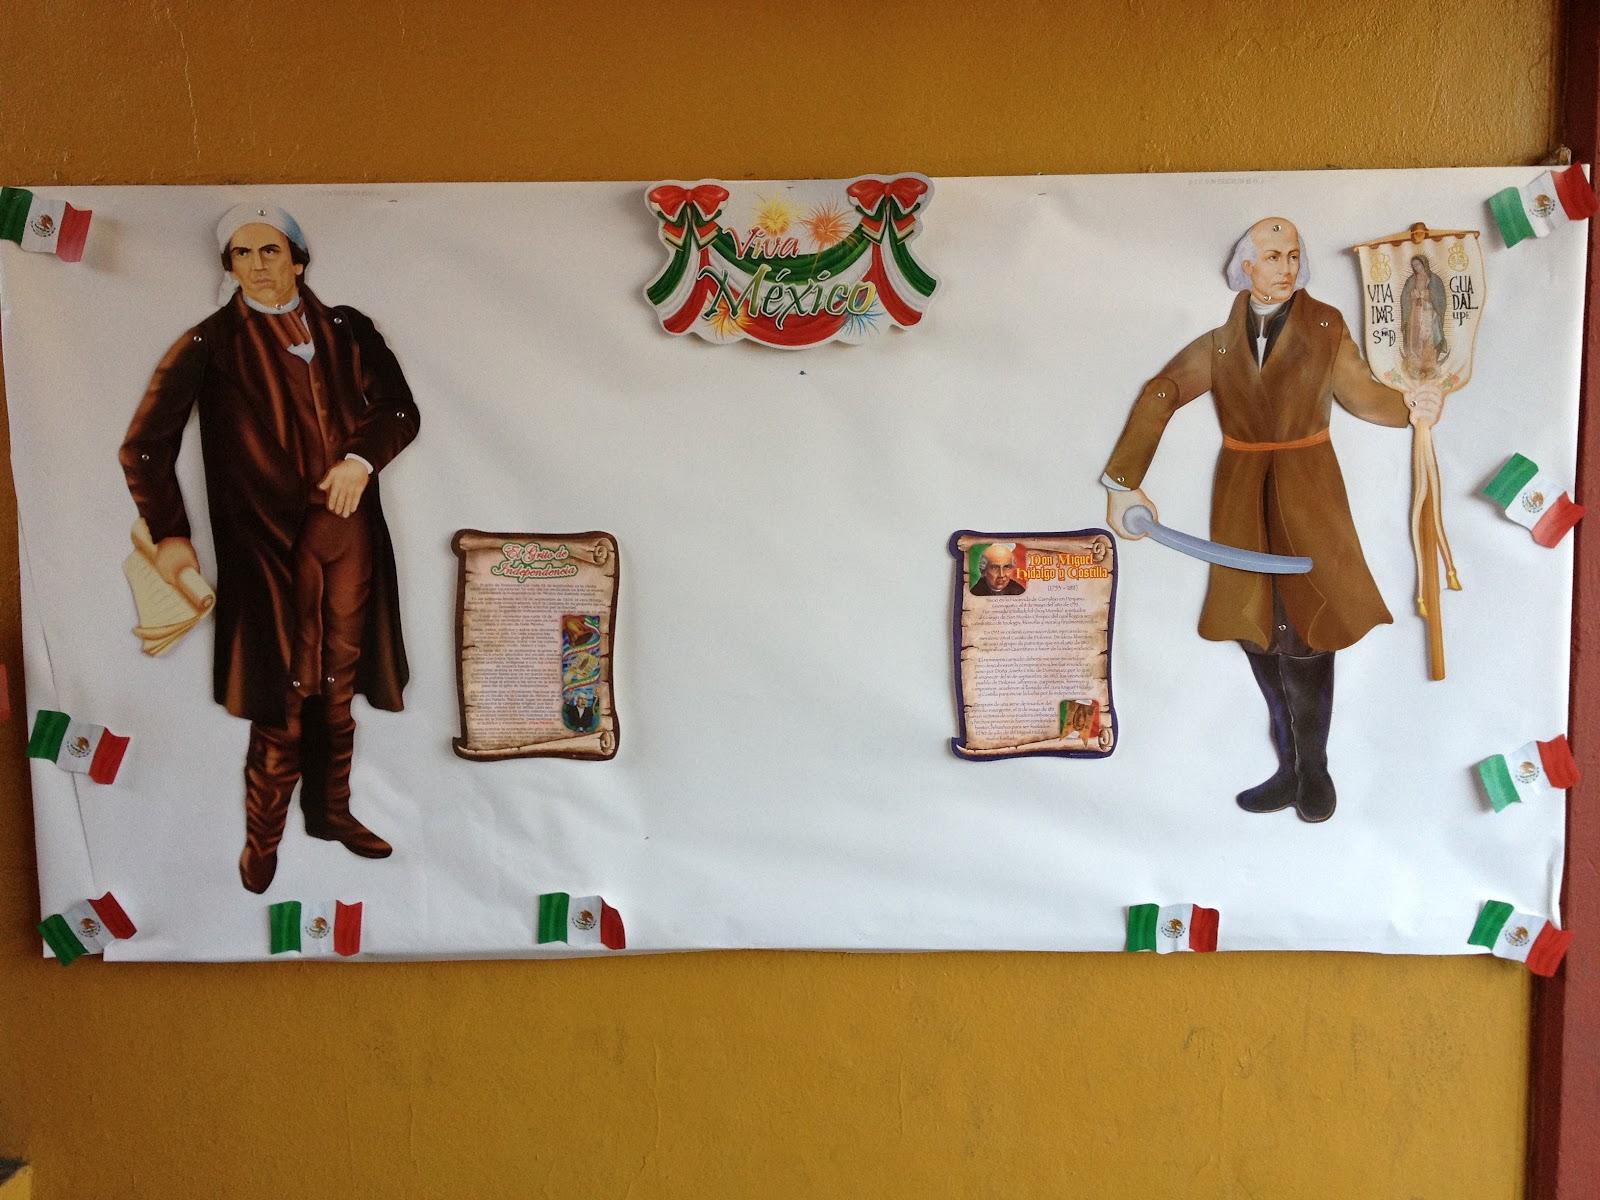 Escuela secundaria rub n niebla gonz lez for Cultura para periodico mural